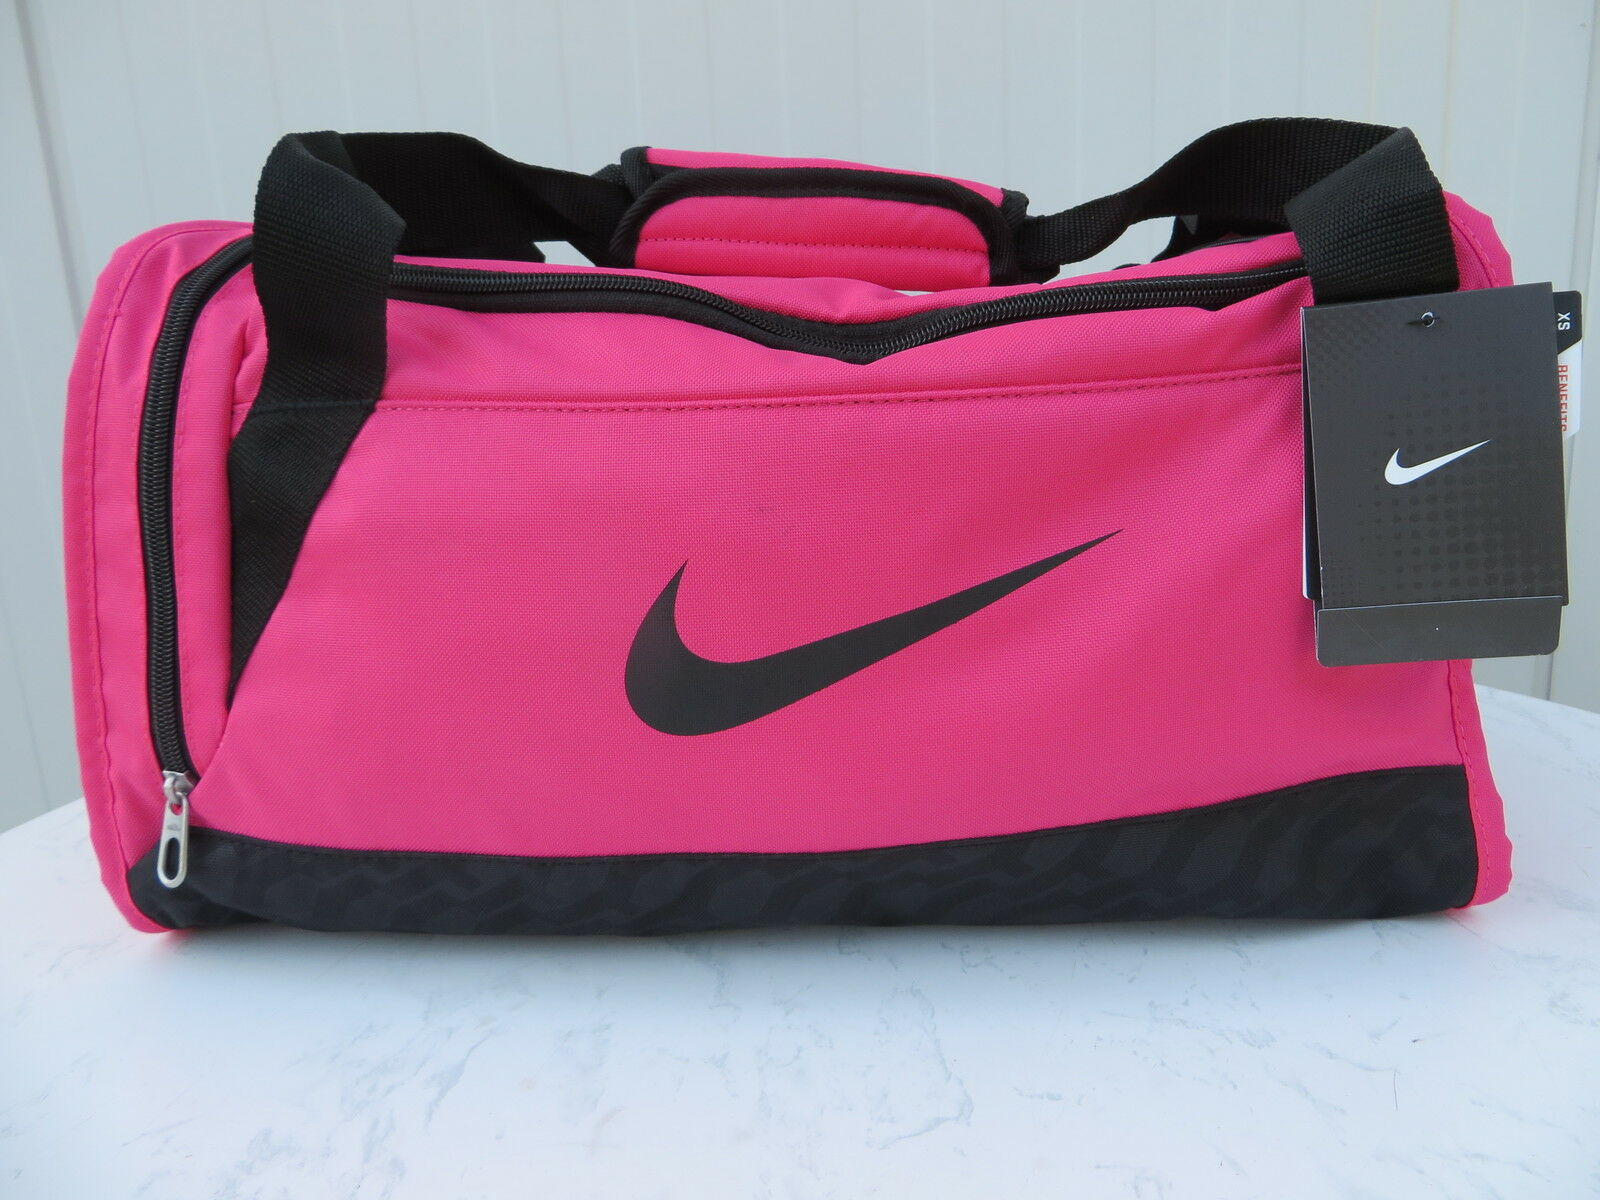 nike sporttasche pink brasilia fitness damen tasche bag. Black Bedroom Furniture Sets. Home Design Ideas